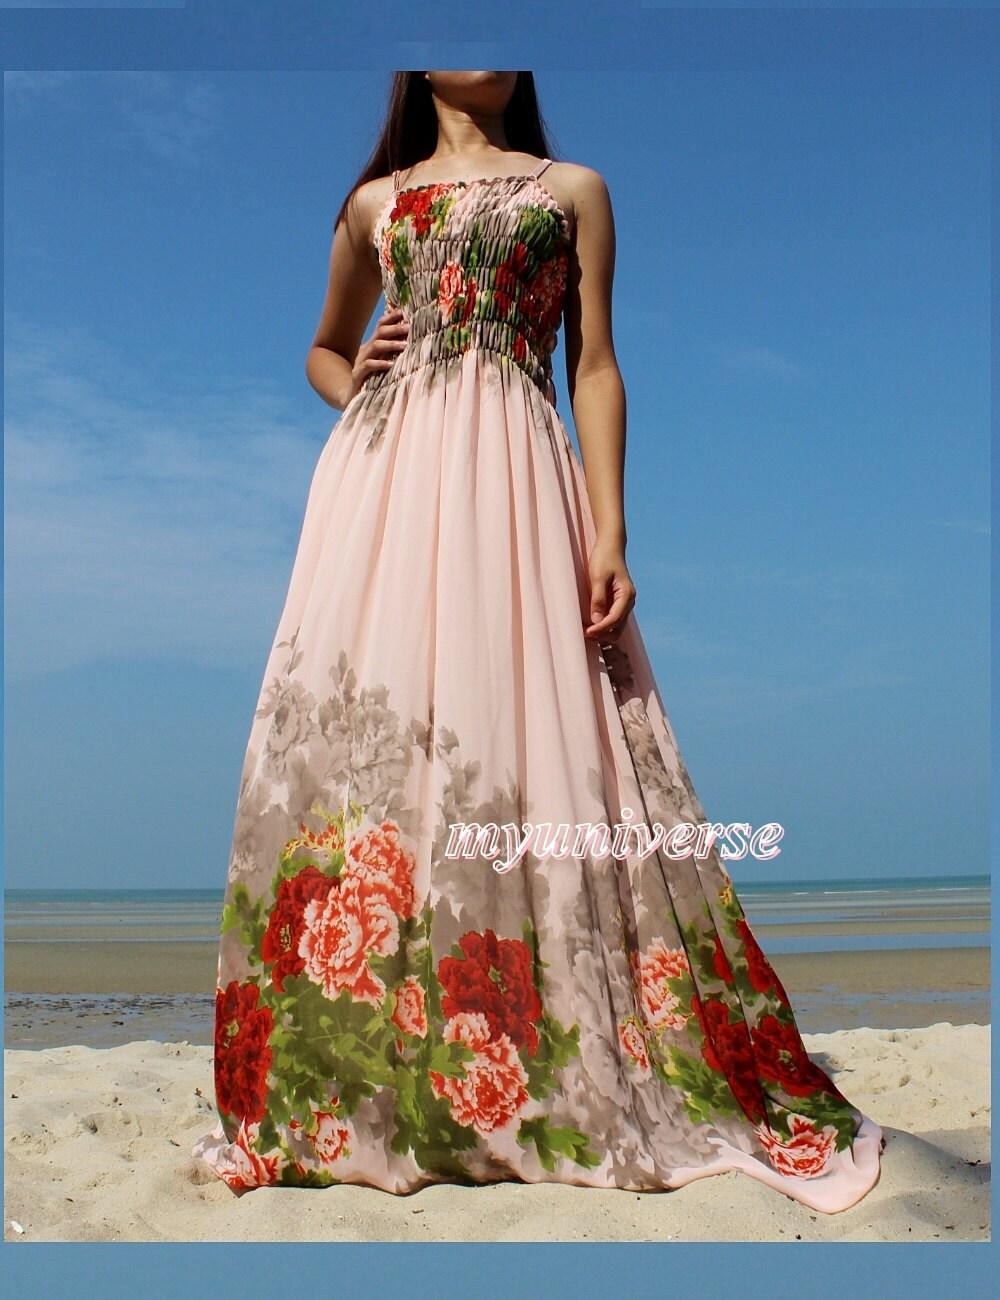 Peach Maxi Dress Prom Wedding Pink Bridesmaid Dress Sundress